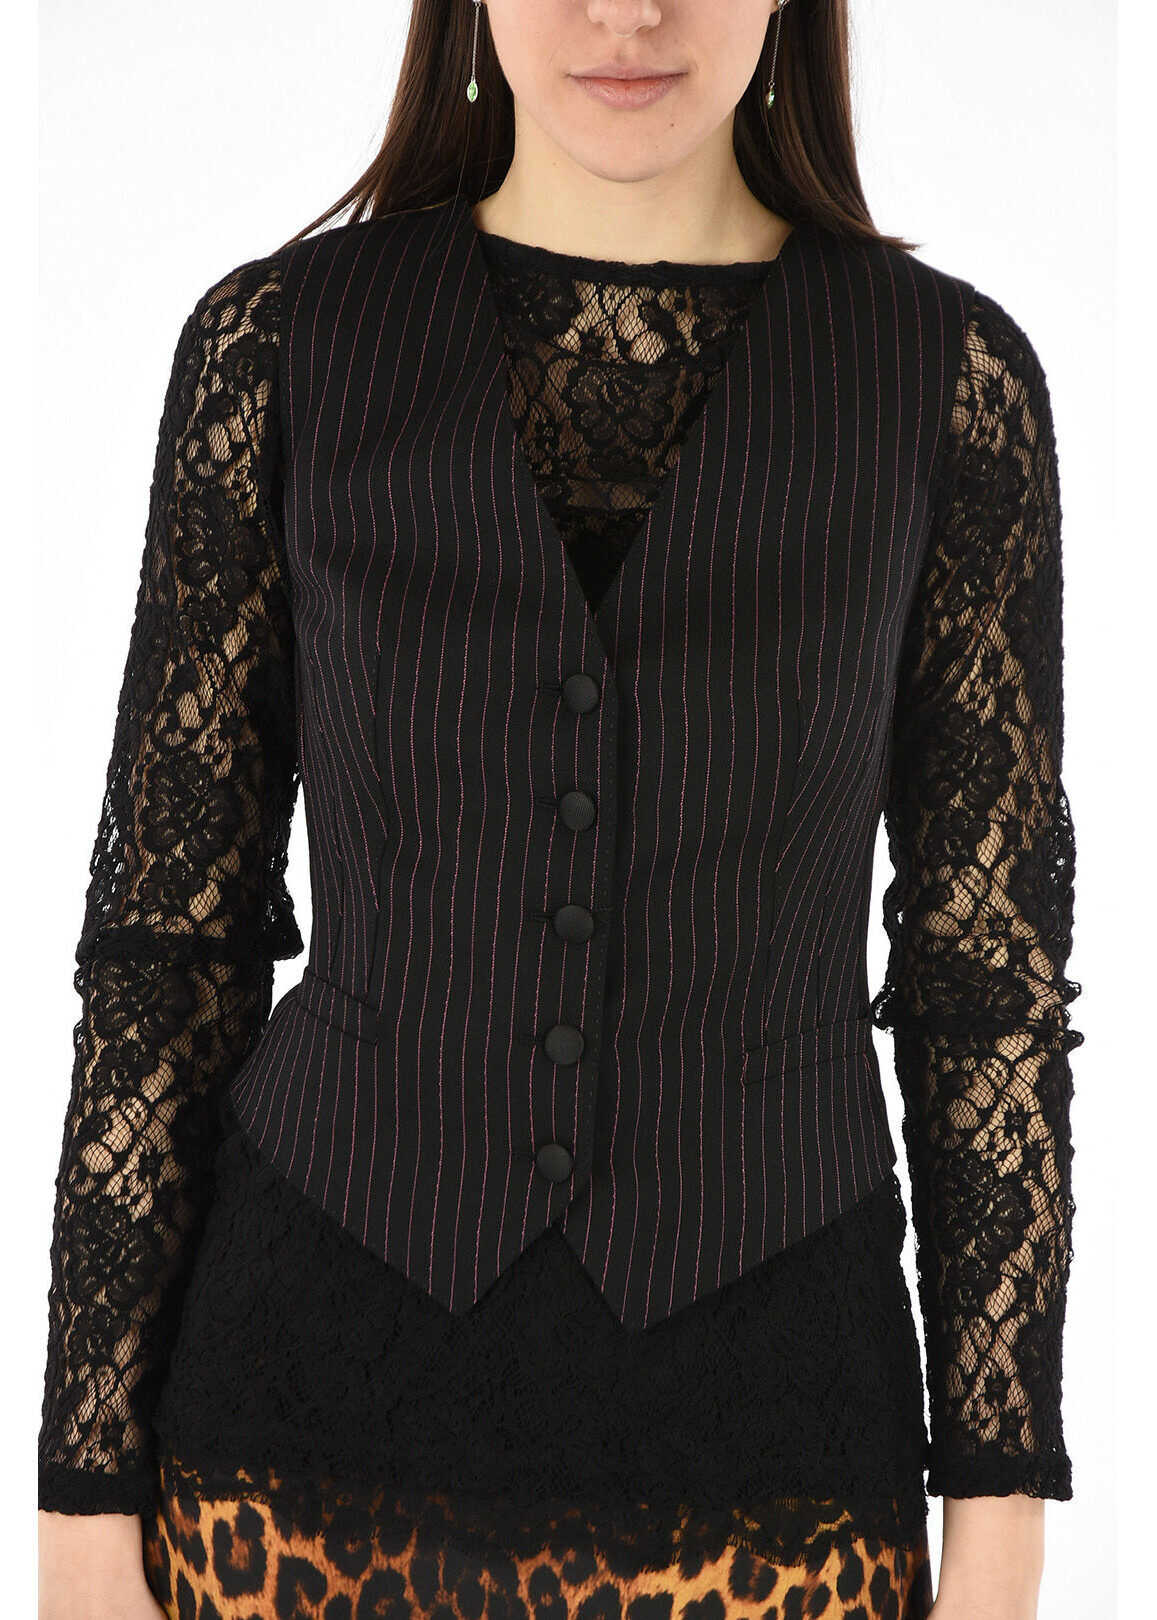 Dolce & Gabbana virgin wool vest BLACK